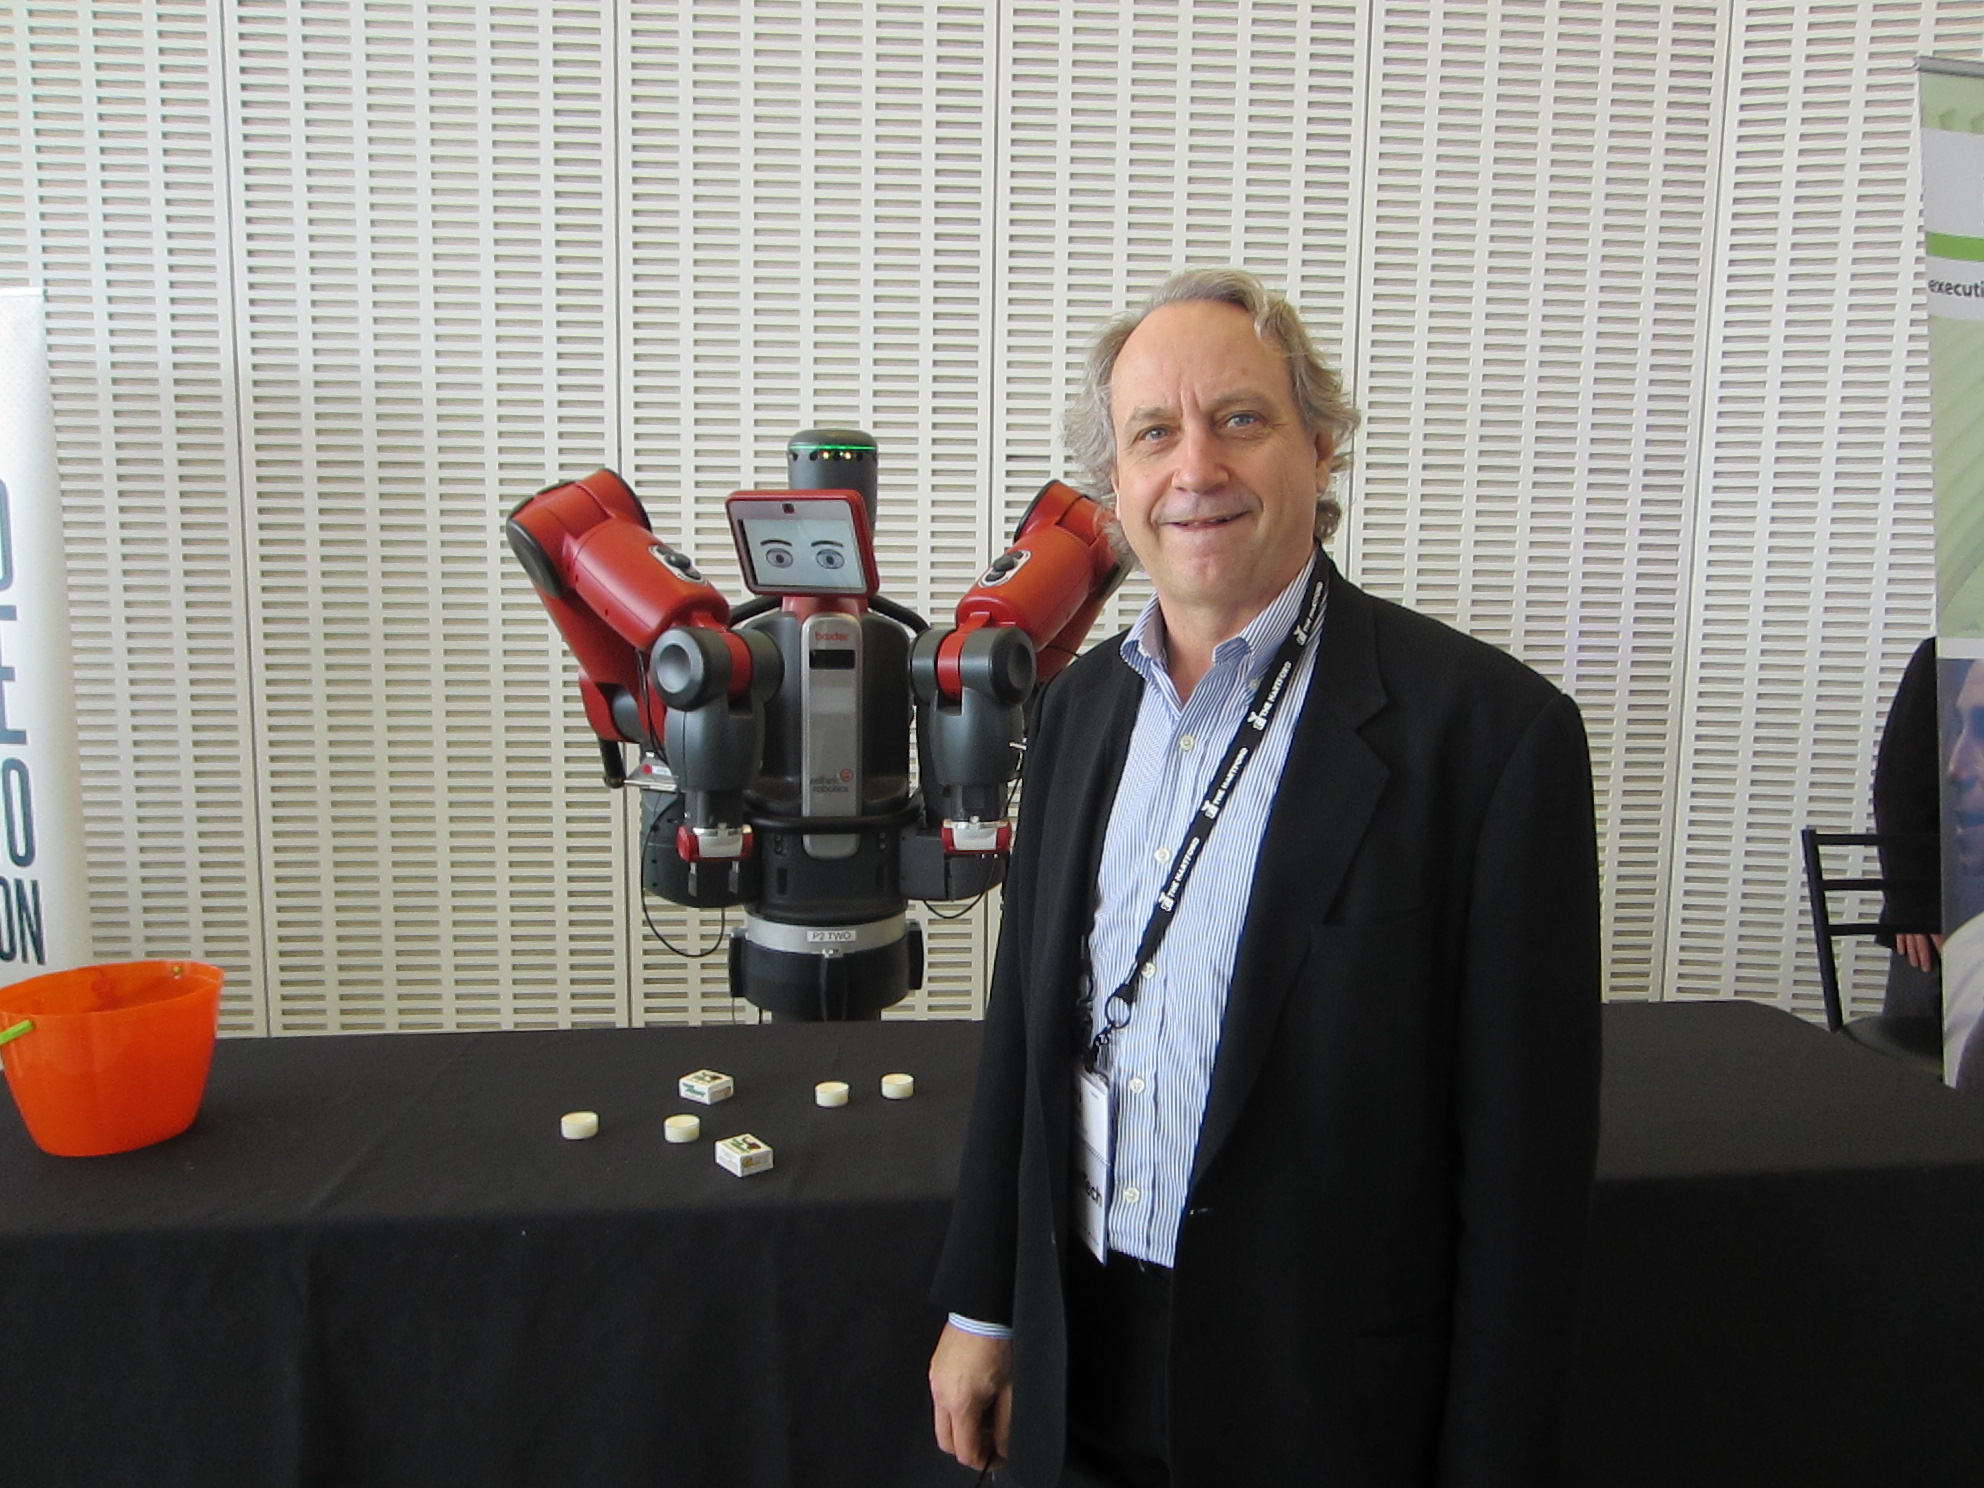 Baxter (left) with Rethink Robotics CEO Rodney Brooks.